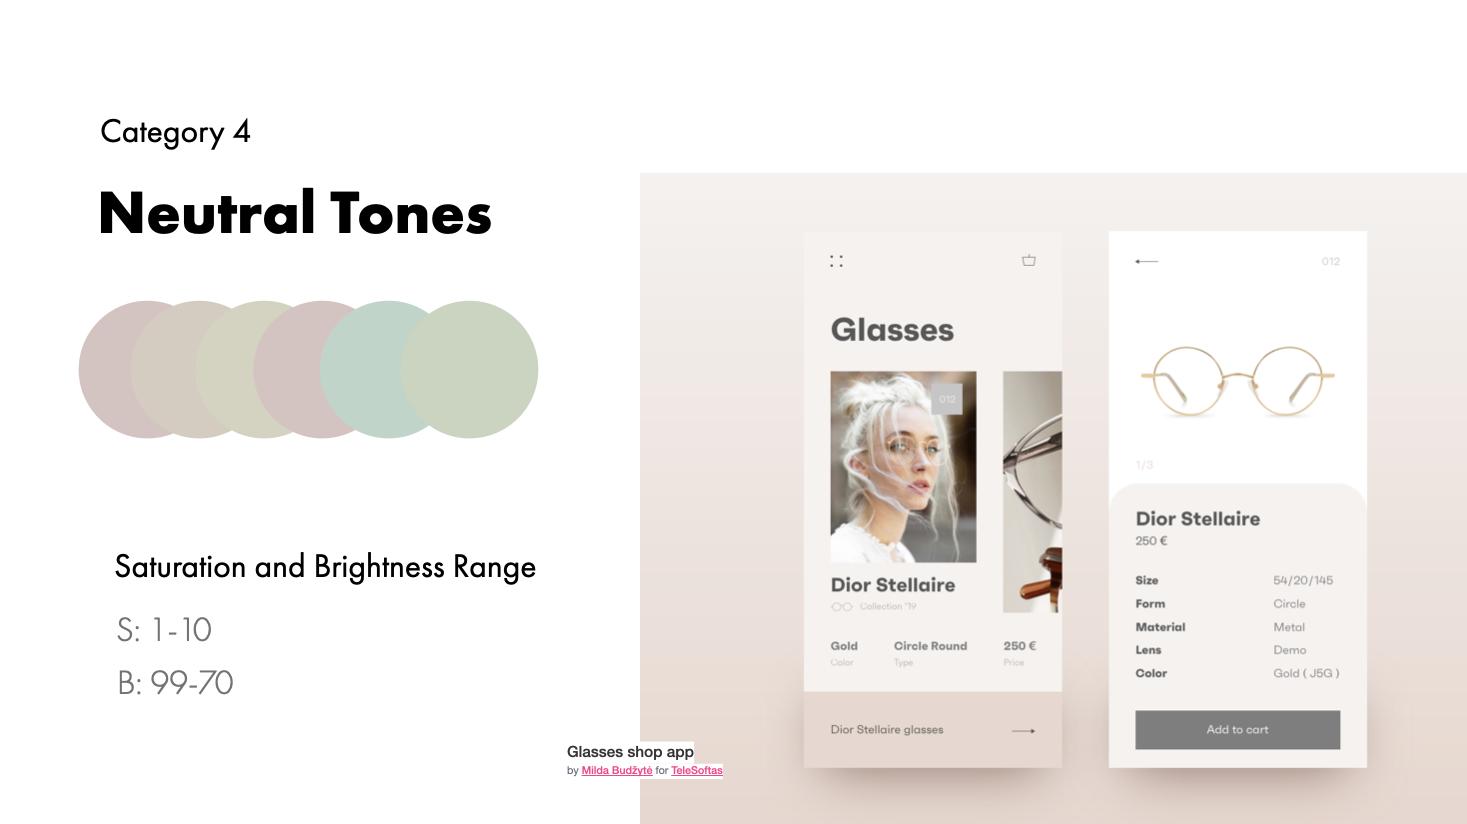 Neutral tone examples and range | Glasses shop app by Milda Budžytė for TeleSoftas